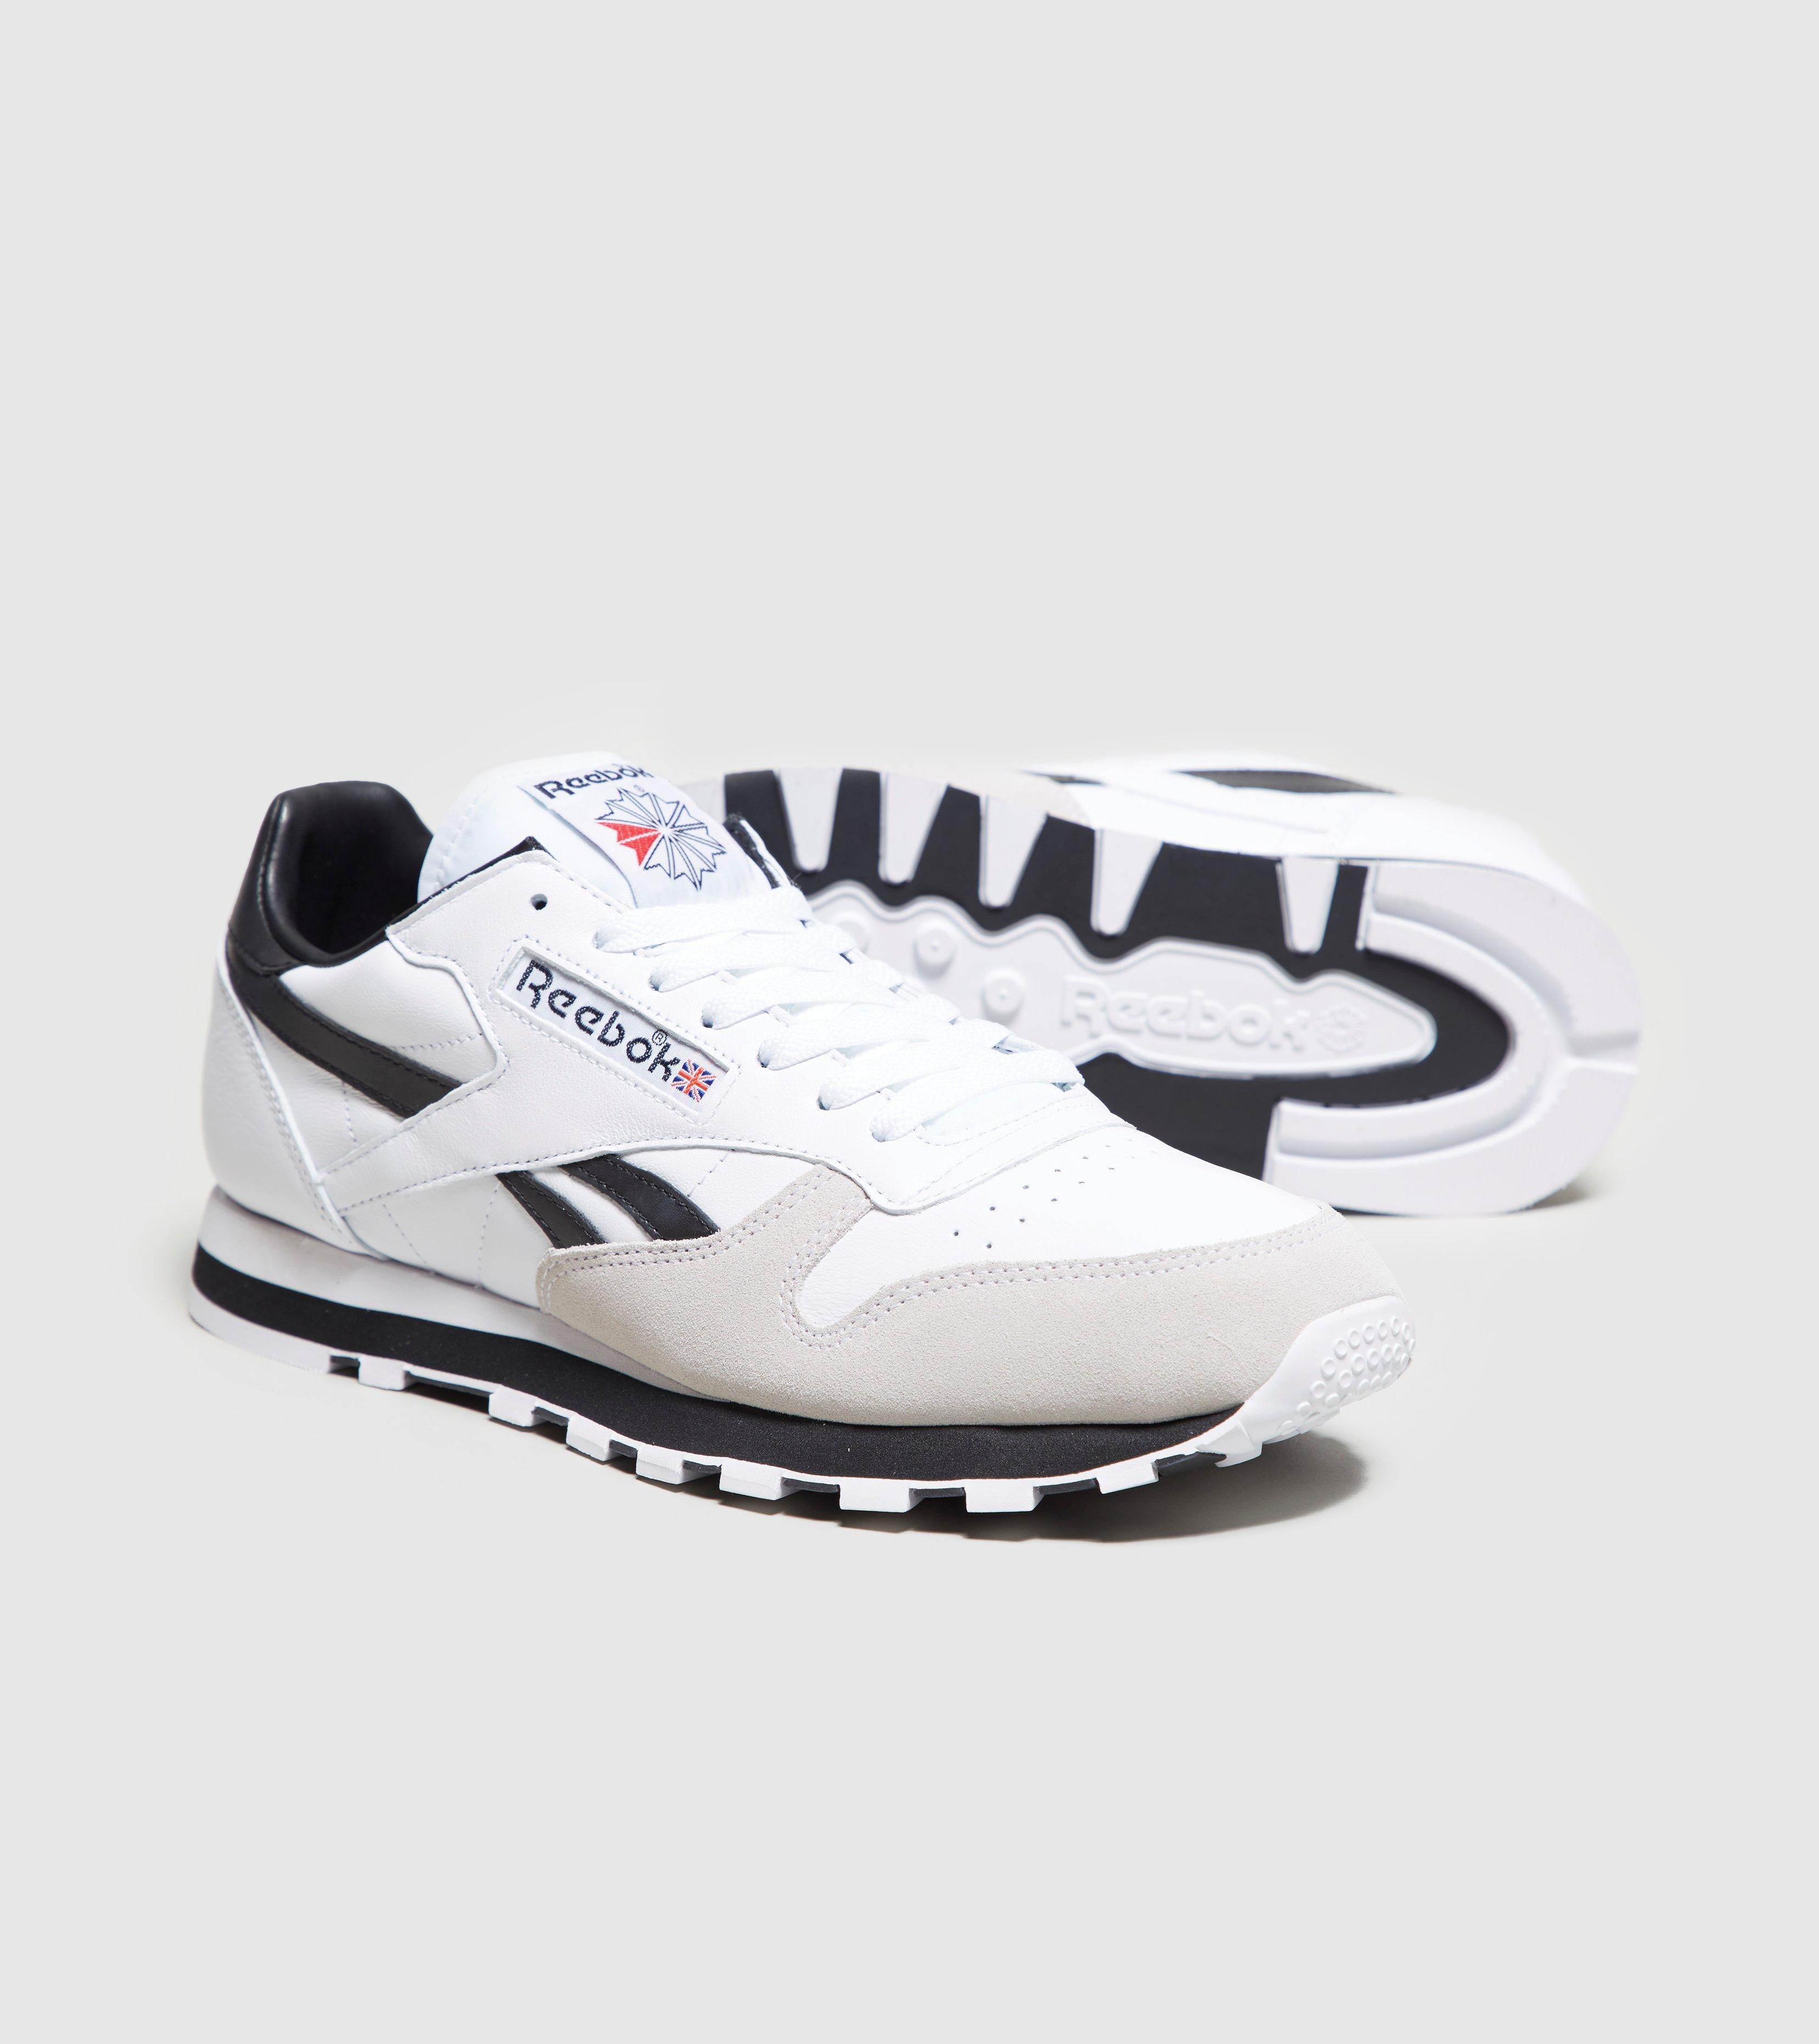 Reebok White Classic Leather Trc for men